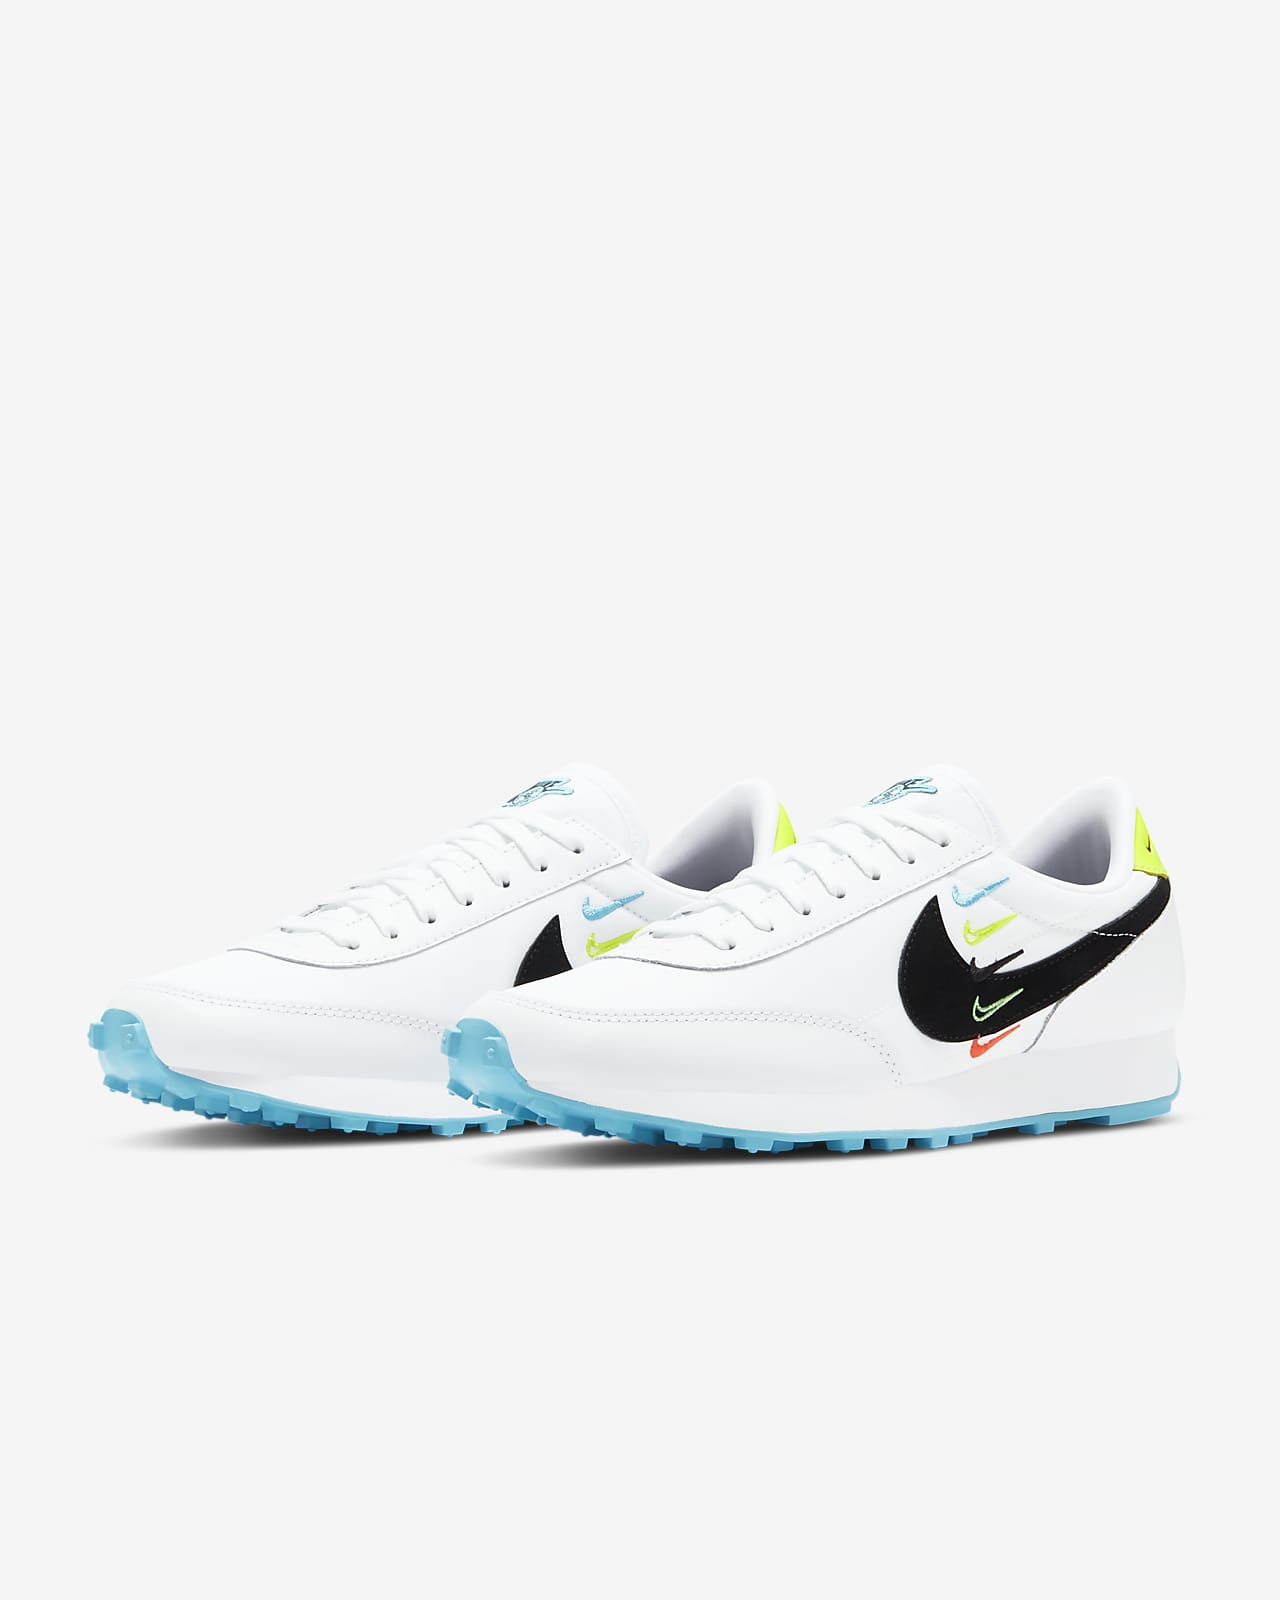 Nike Daybreak Women's Shoe. Nike SG